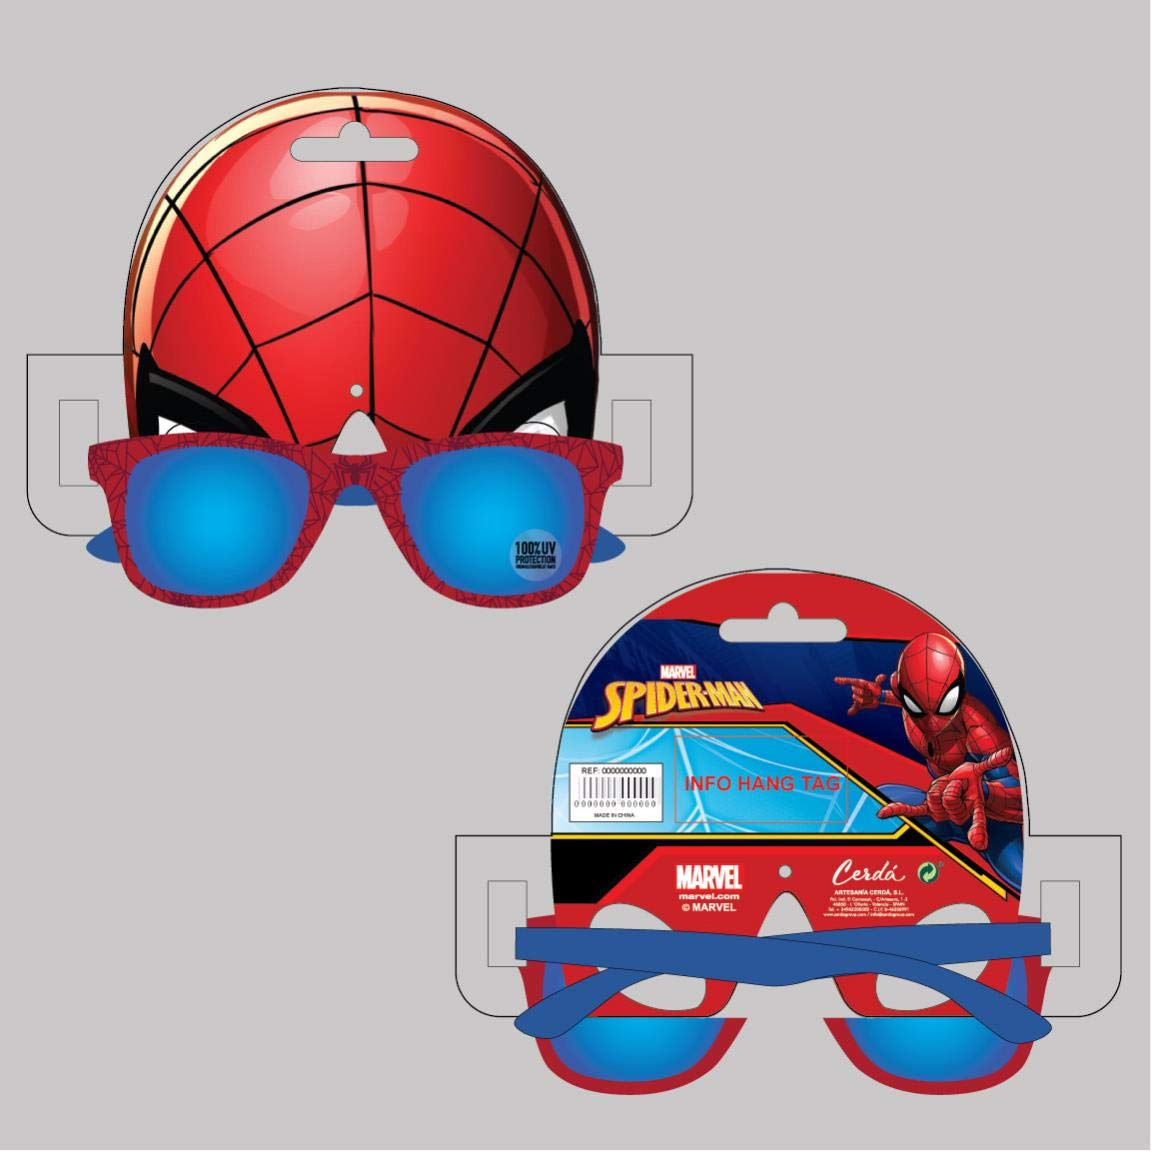 52 Bambino Artesania Cerda Gafas De Sol Spiderman Occhiali da sole Azul Blu